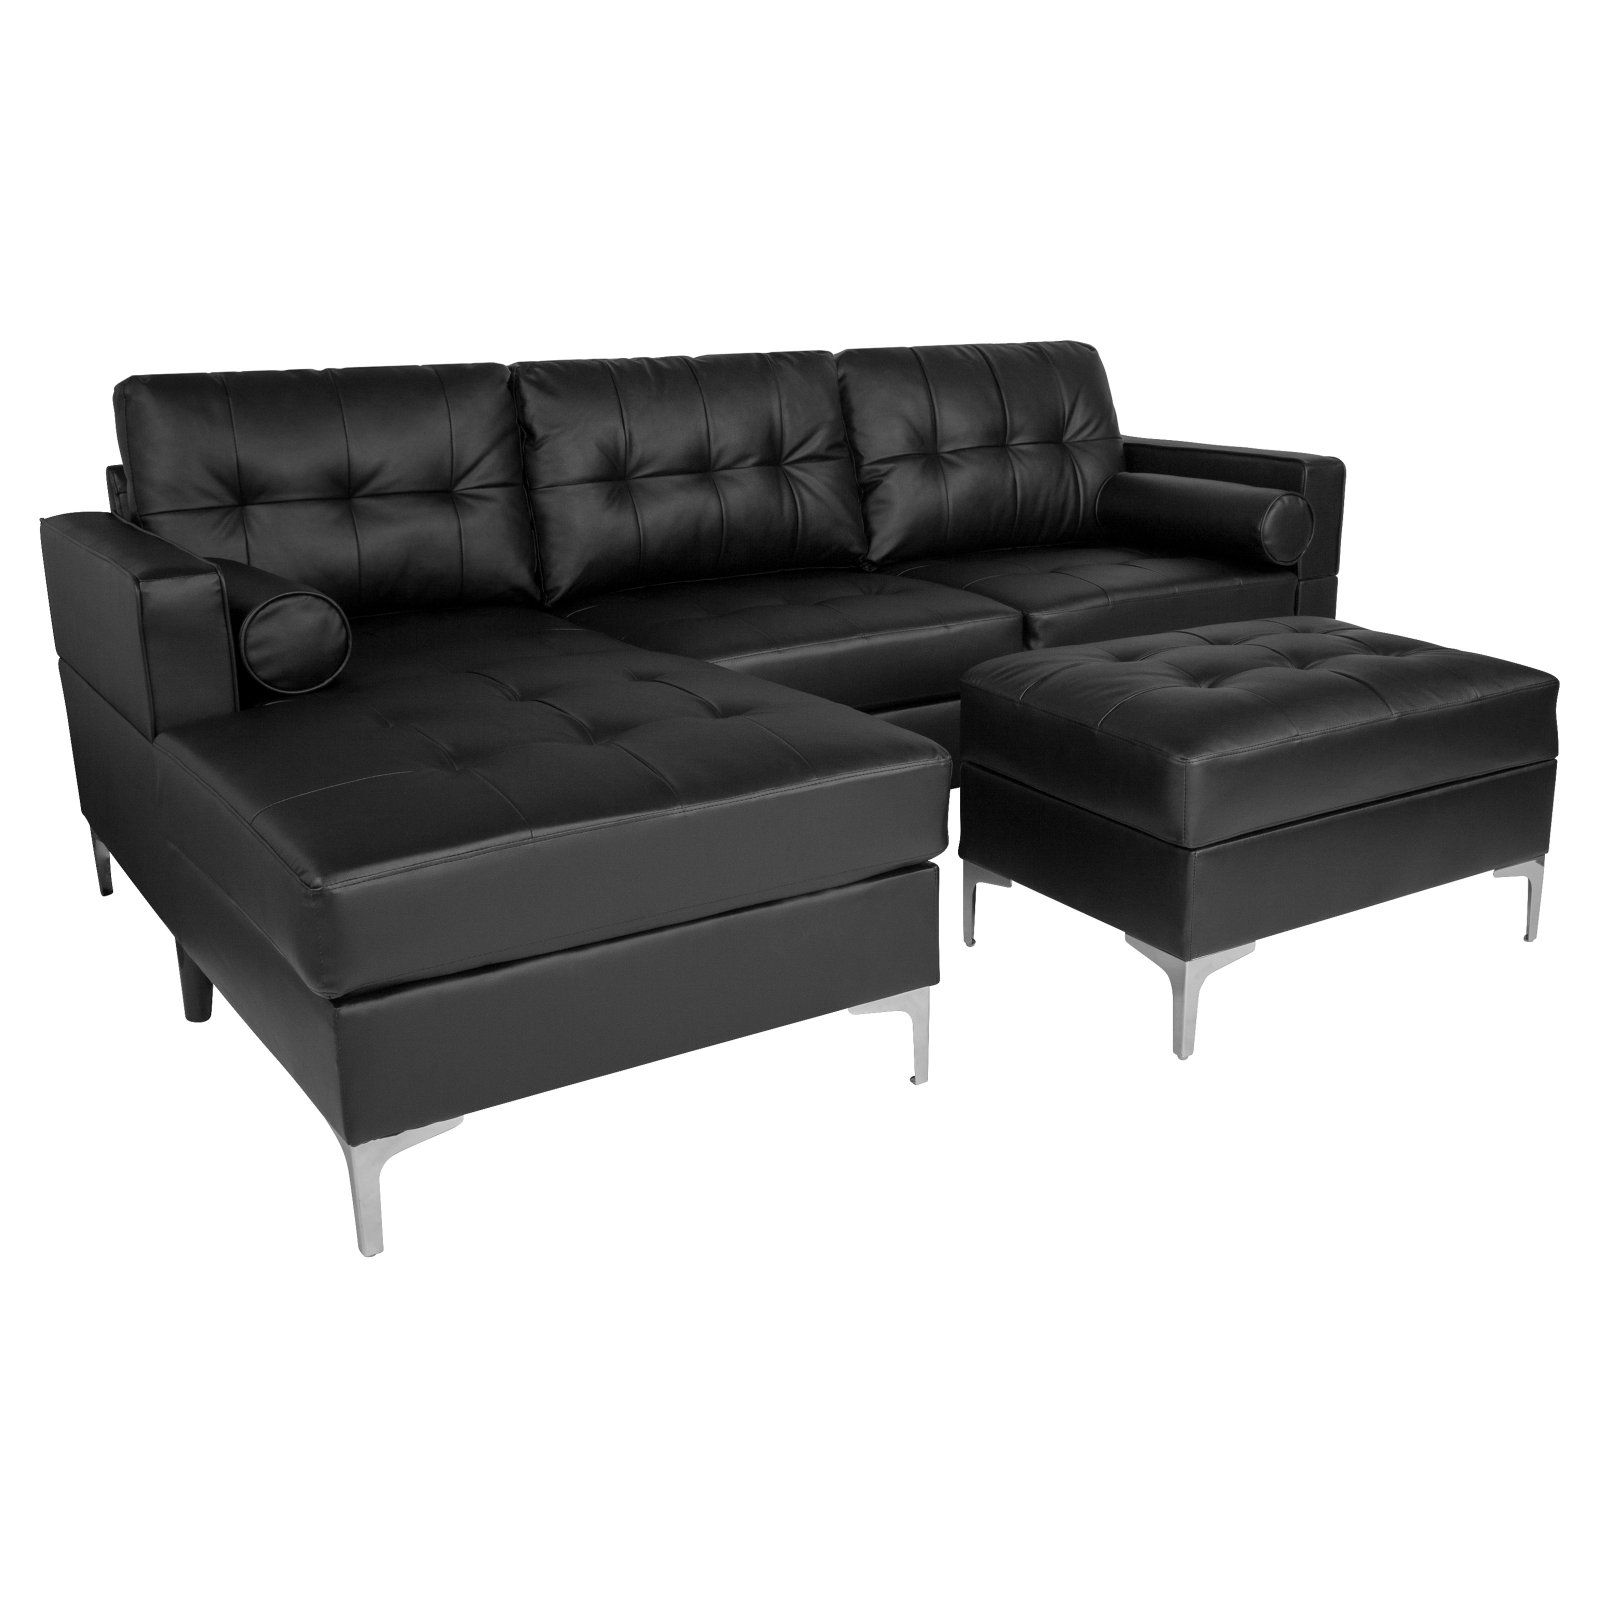 Flash Furniture Riverside Tufted Left Facing Sectional